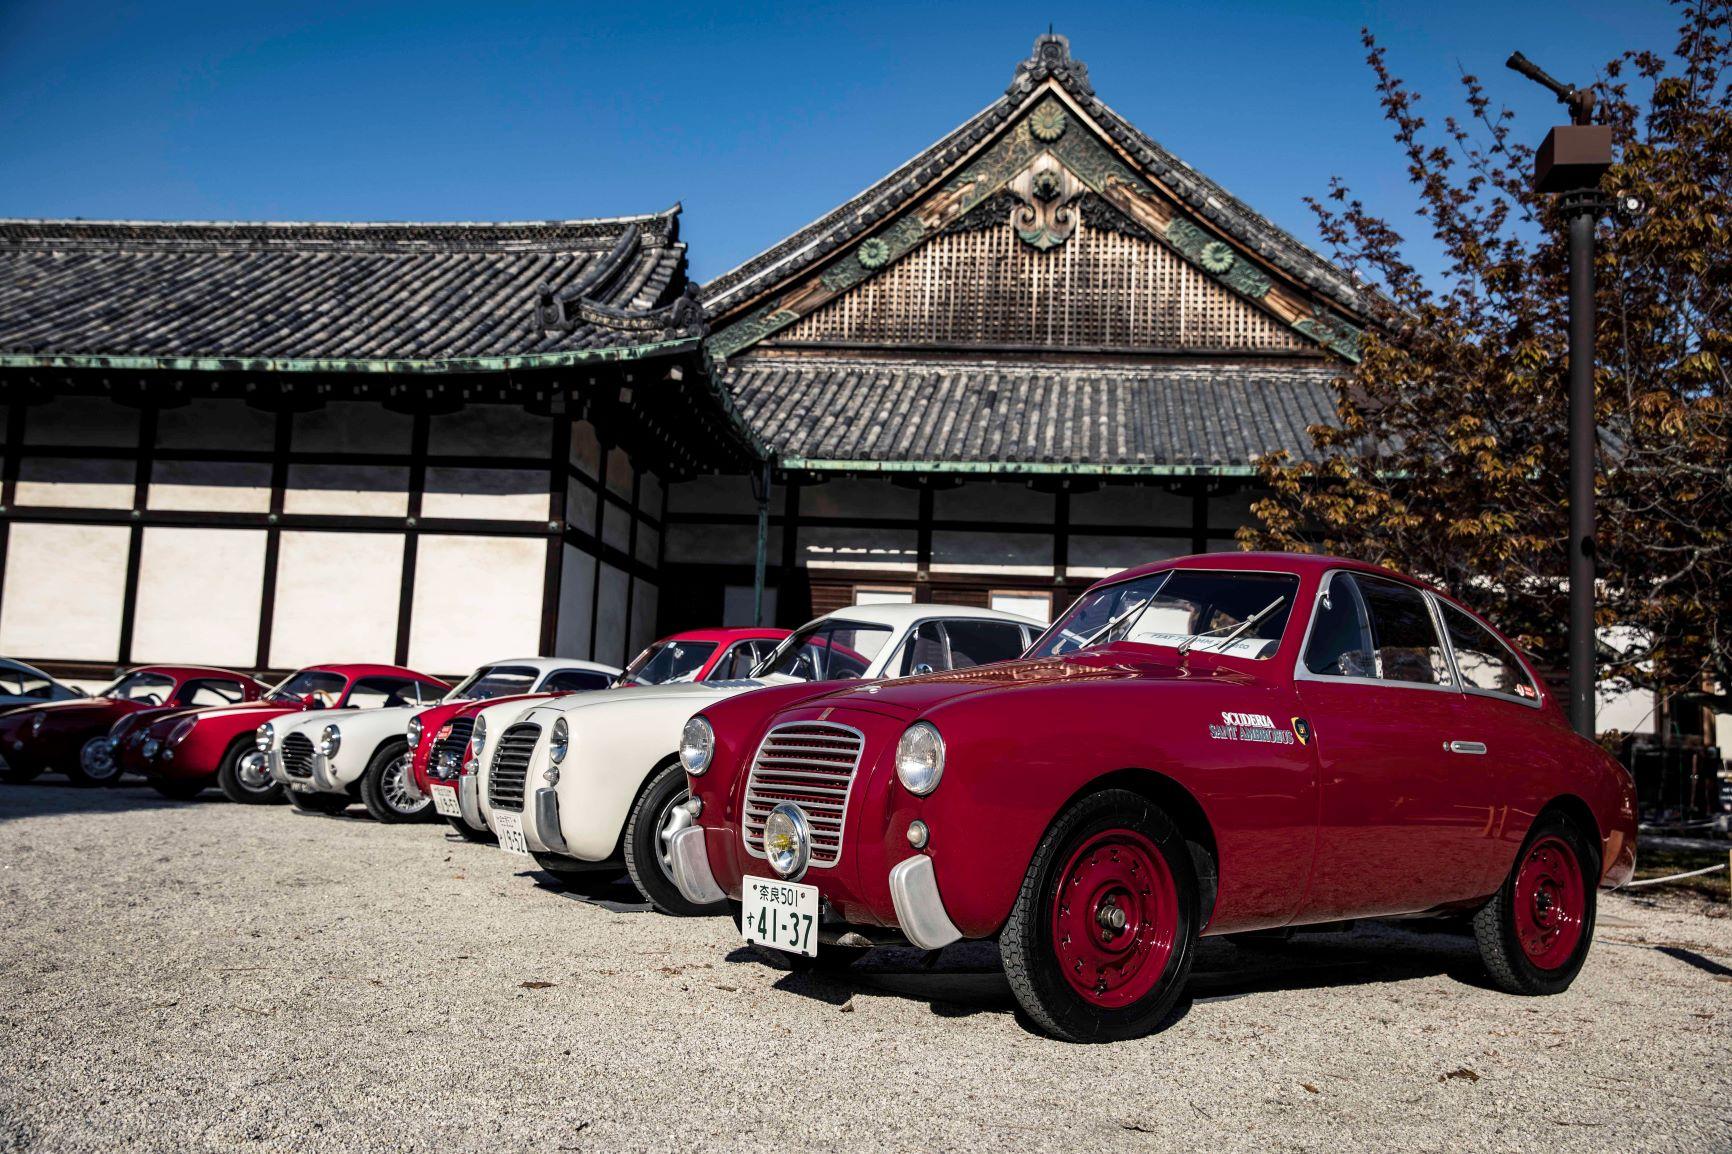 Zagato legende među kolekcionarima automobila